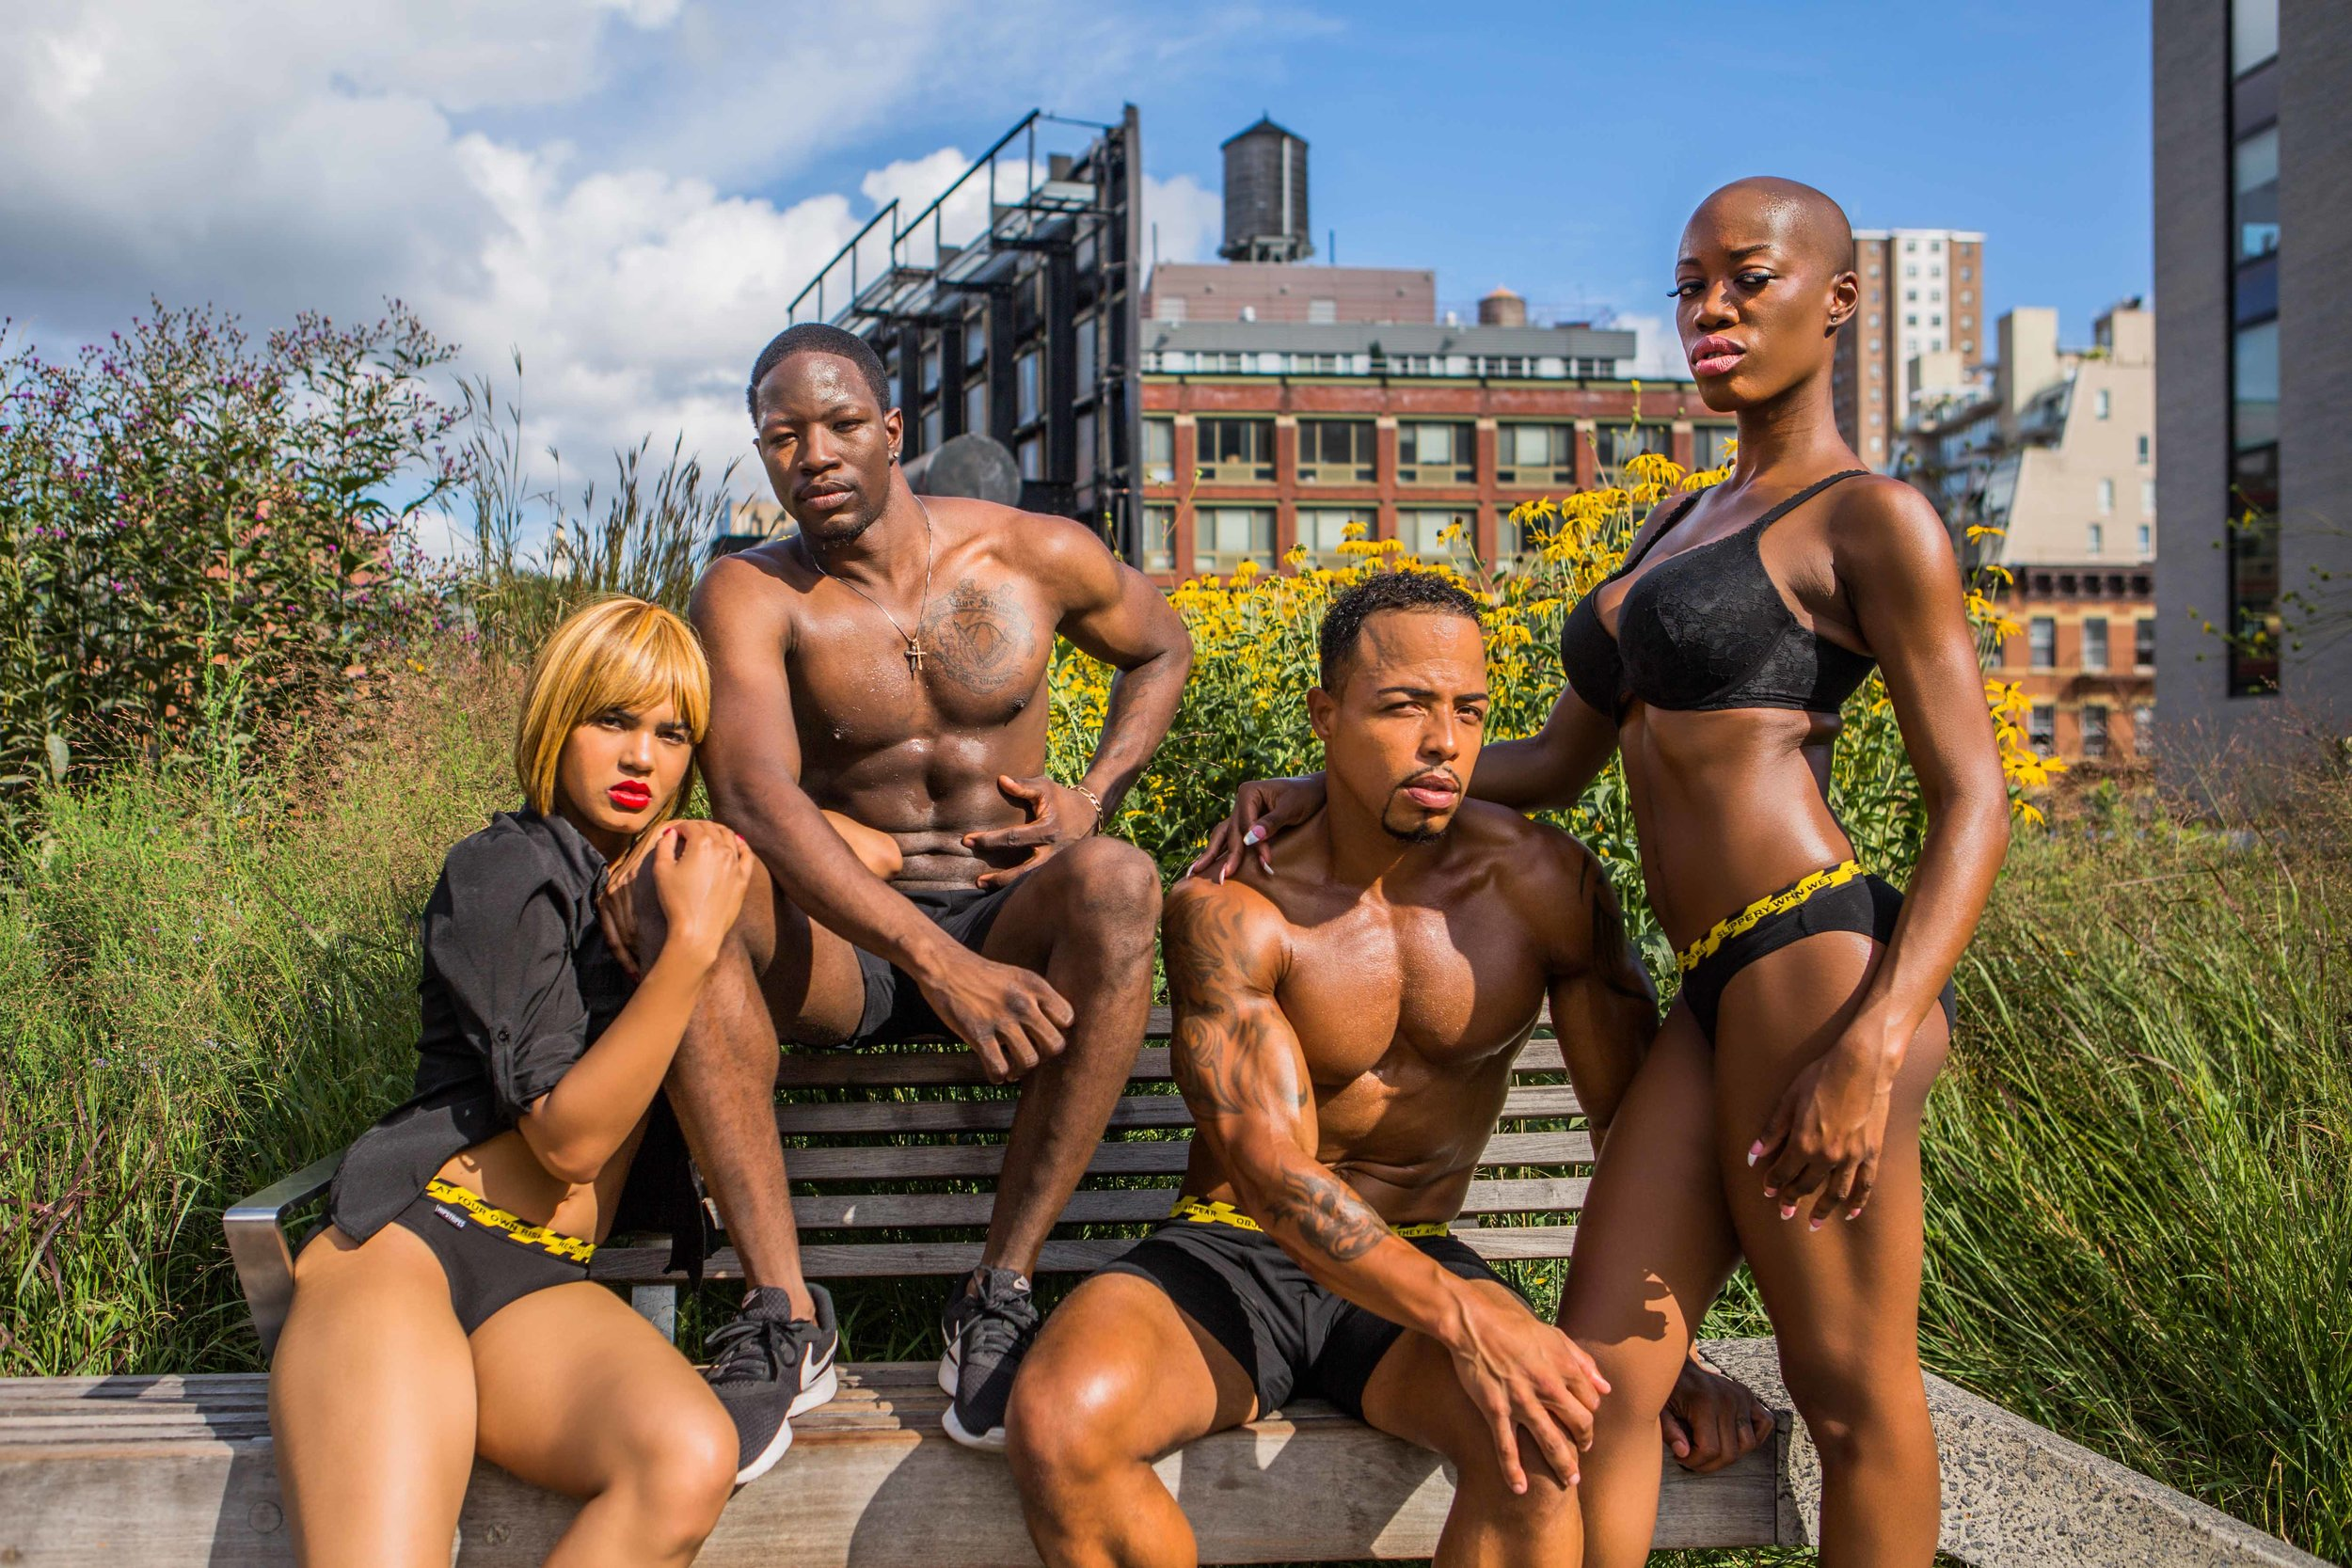 Hipstripes Underwear Shoot - Travalor -  Obiageliaku Anusionwu Jamila Chee Deon Whitter Fazon Gray Antoine Braxton - Tell-A-Vision Films-.jpg